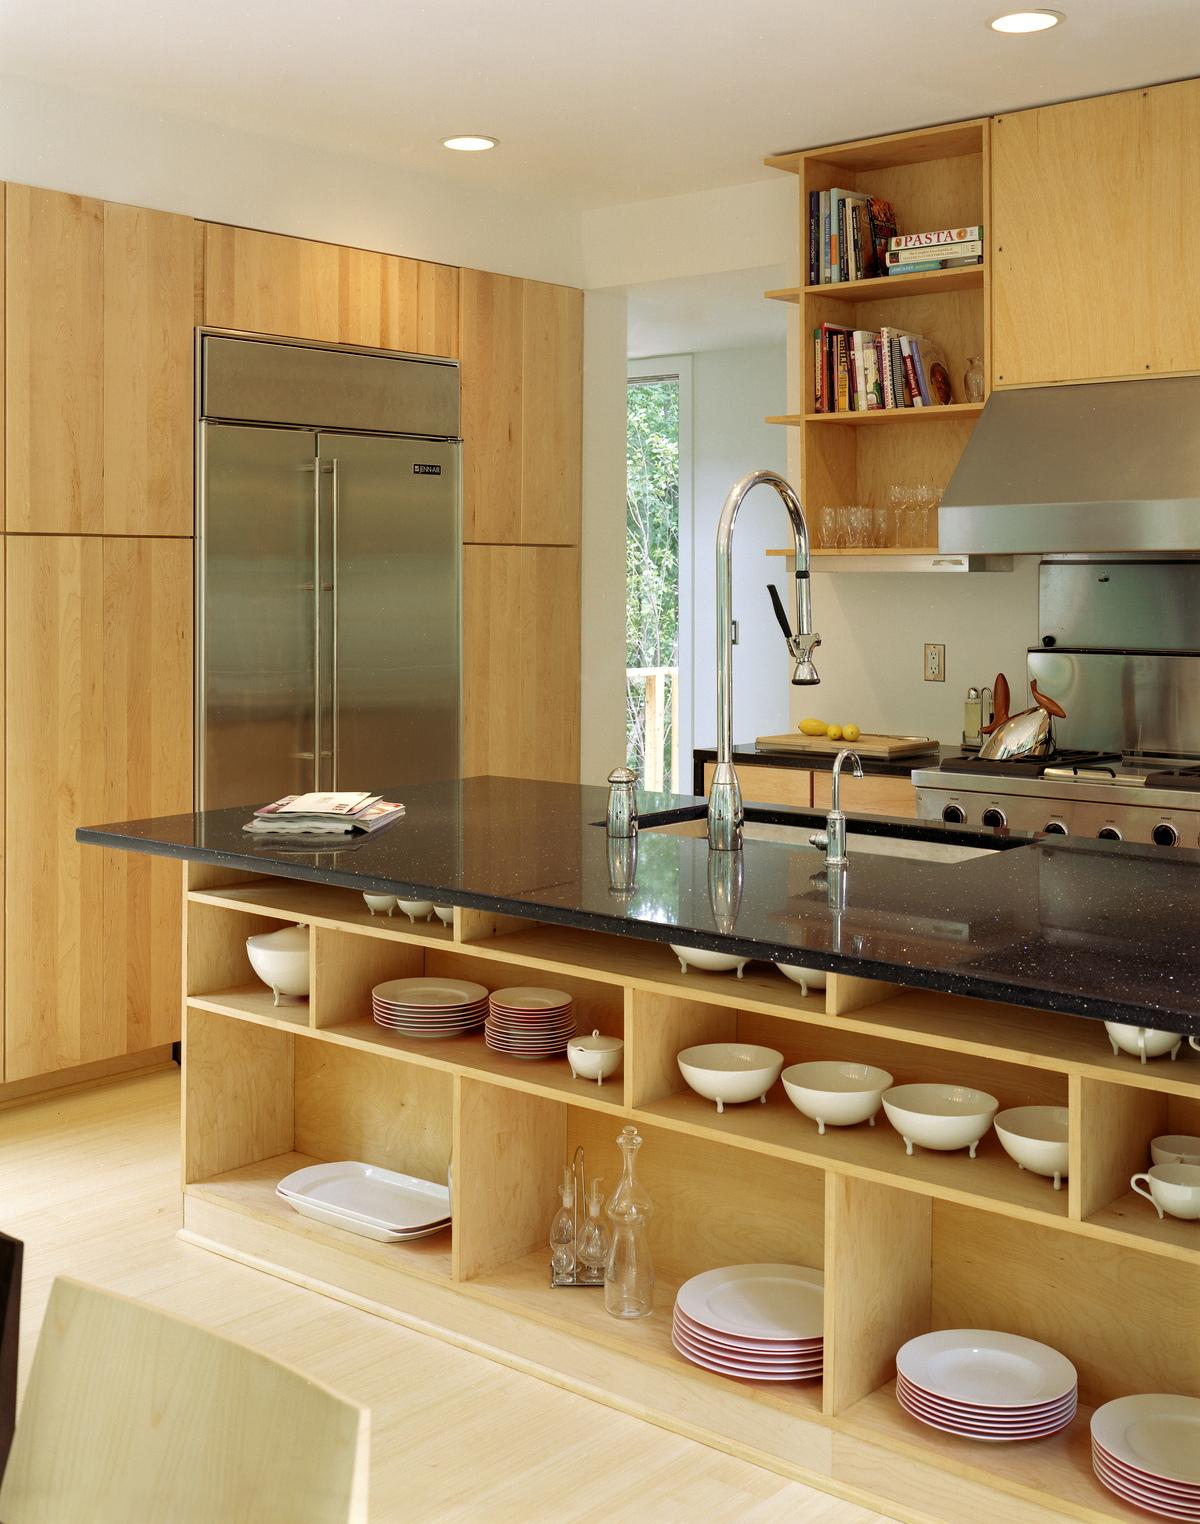 Dwell kitchen, © Roger Davies